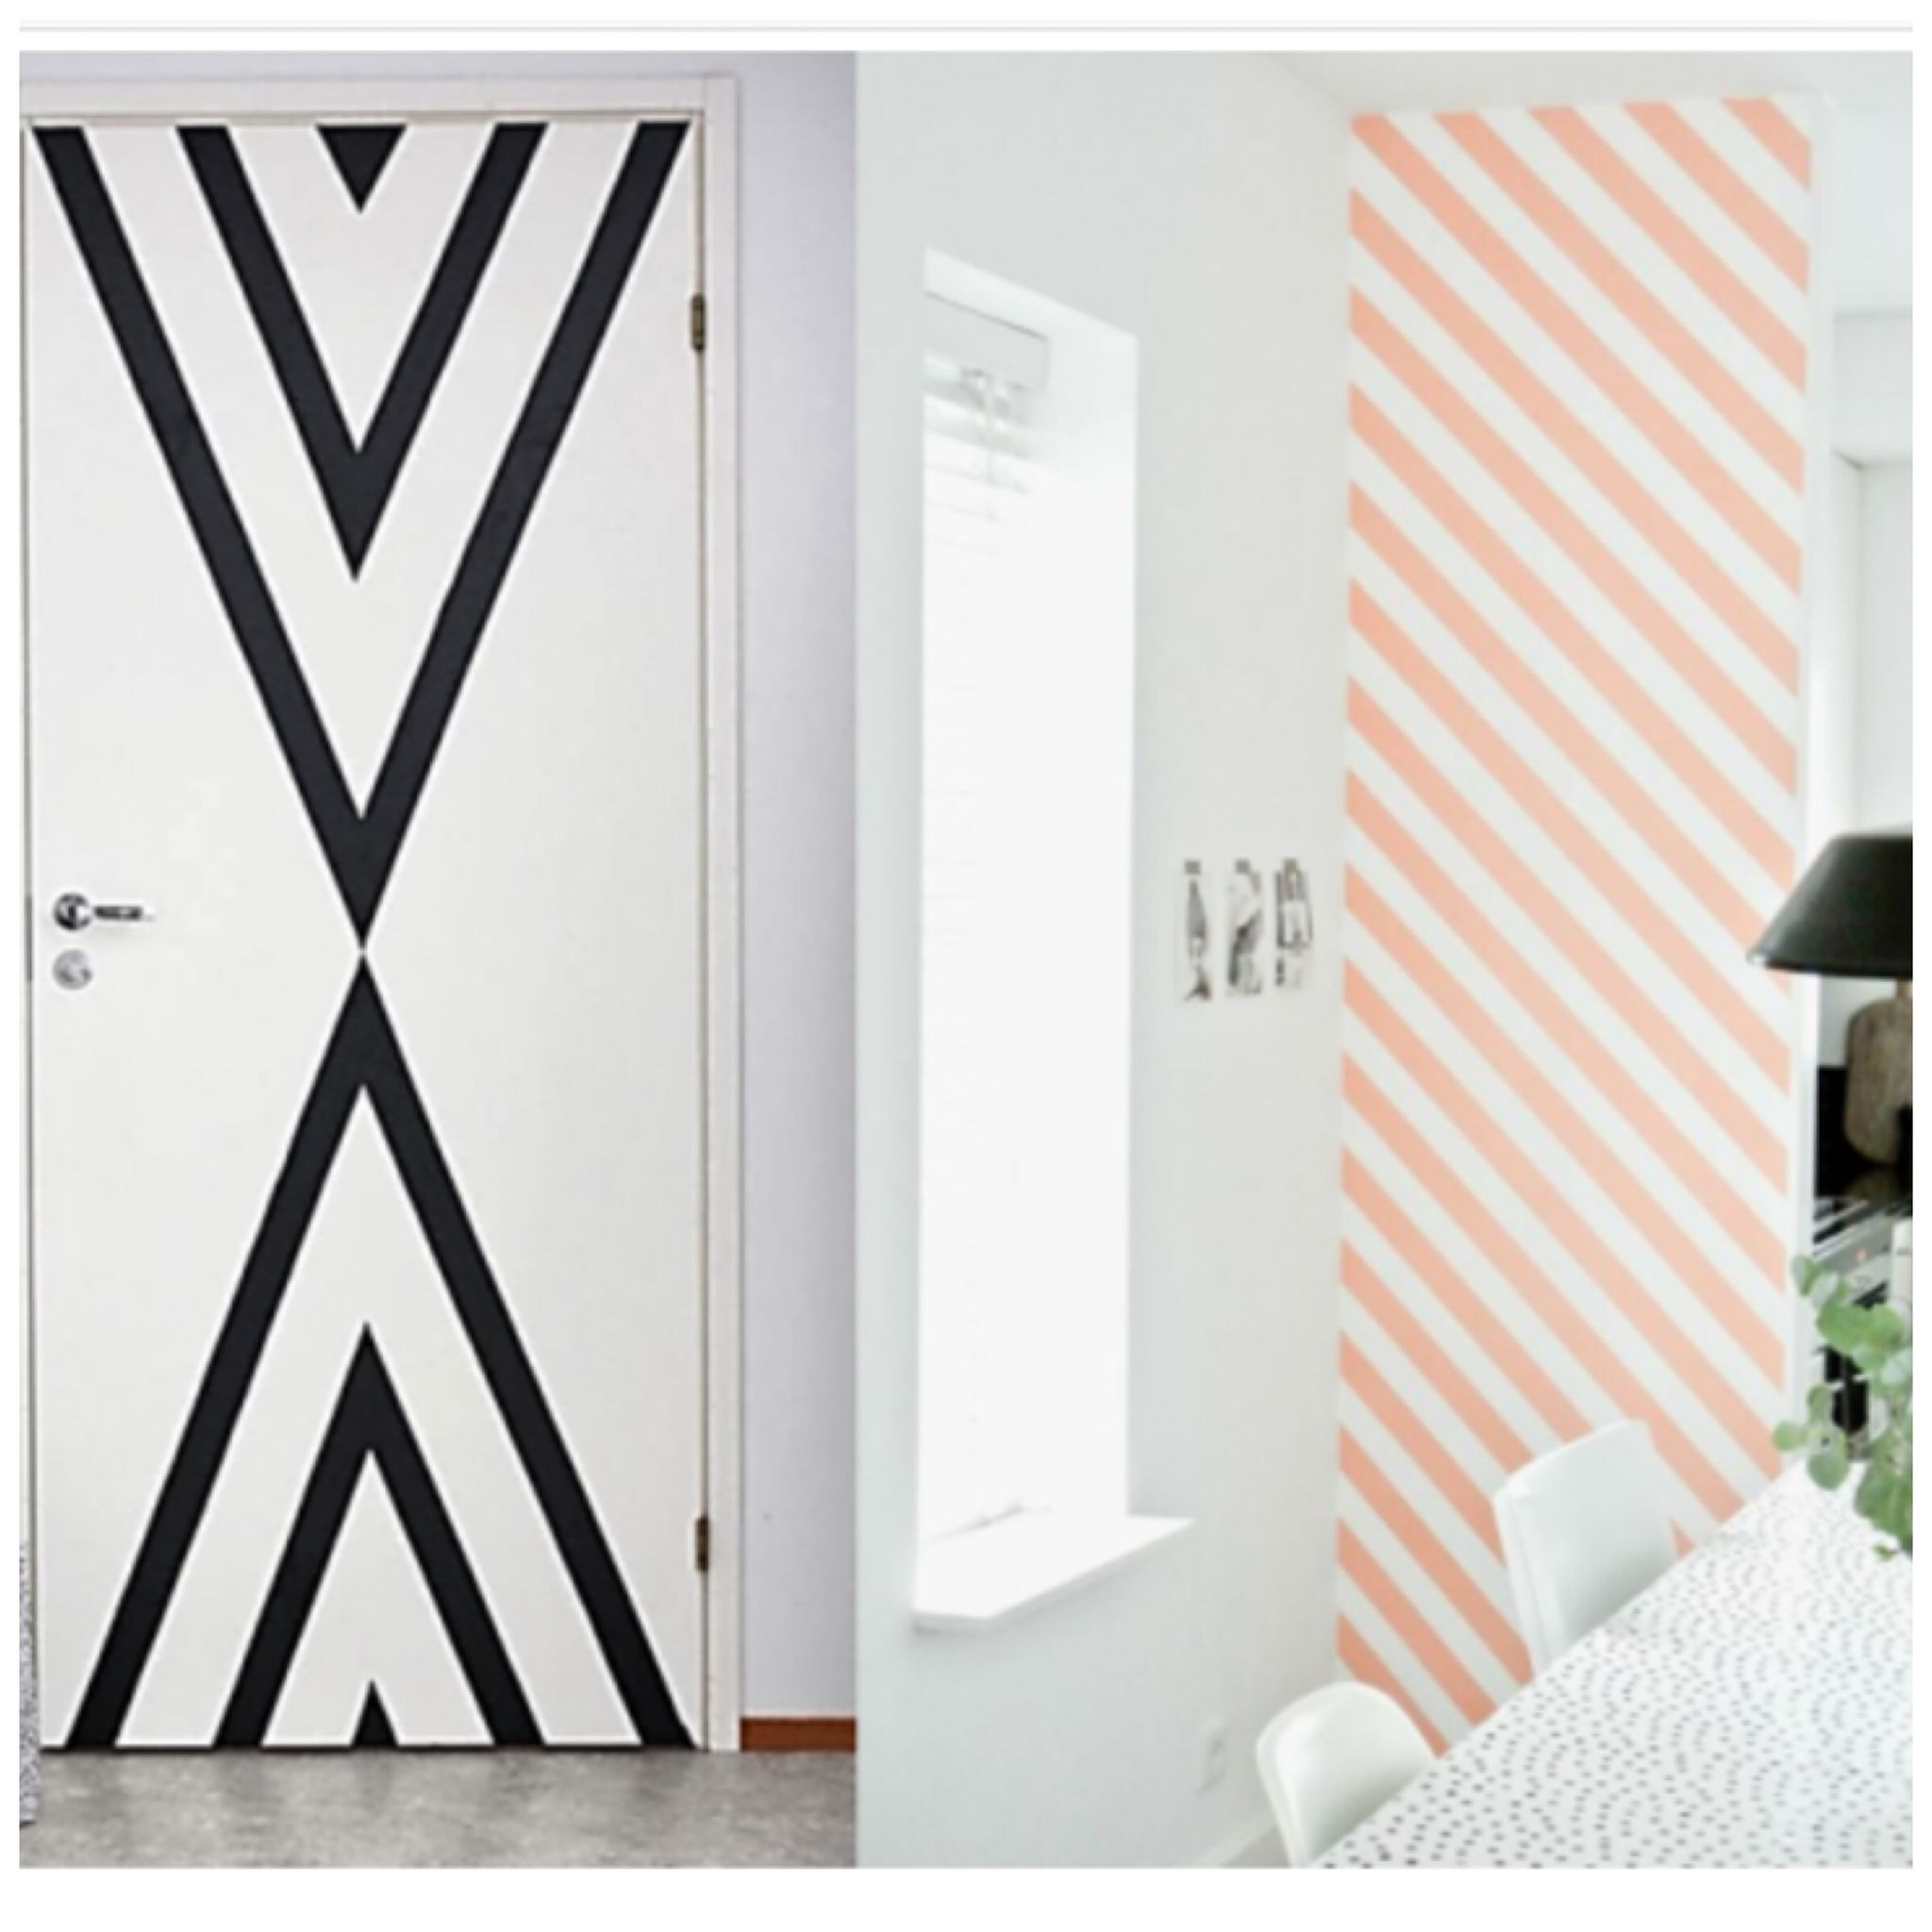 inspi masking tape inspiracje pinterest tape masking and masking tape. Black Bedroom Furniture Sets. Home Design Ideas